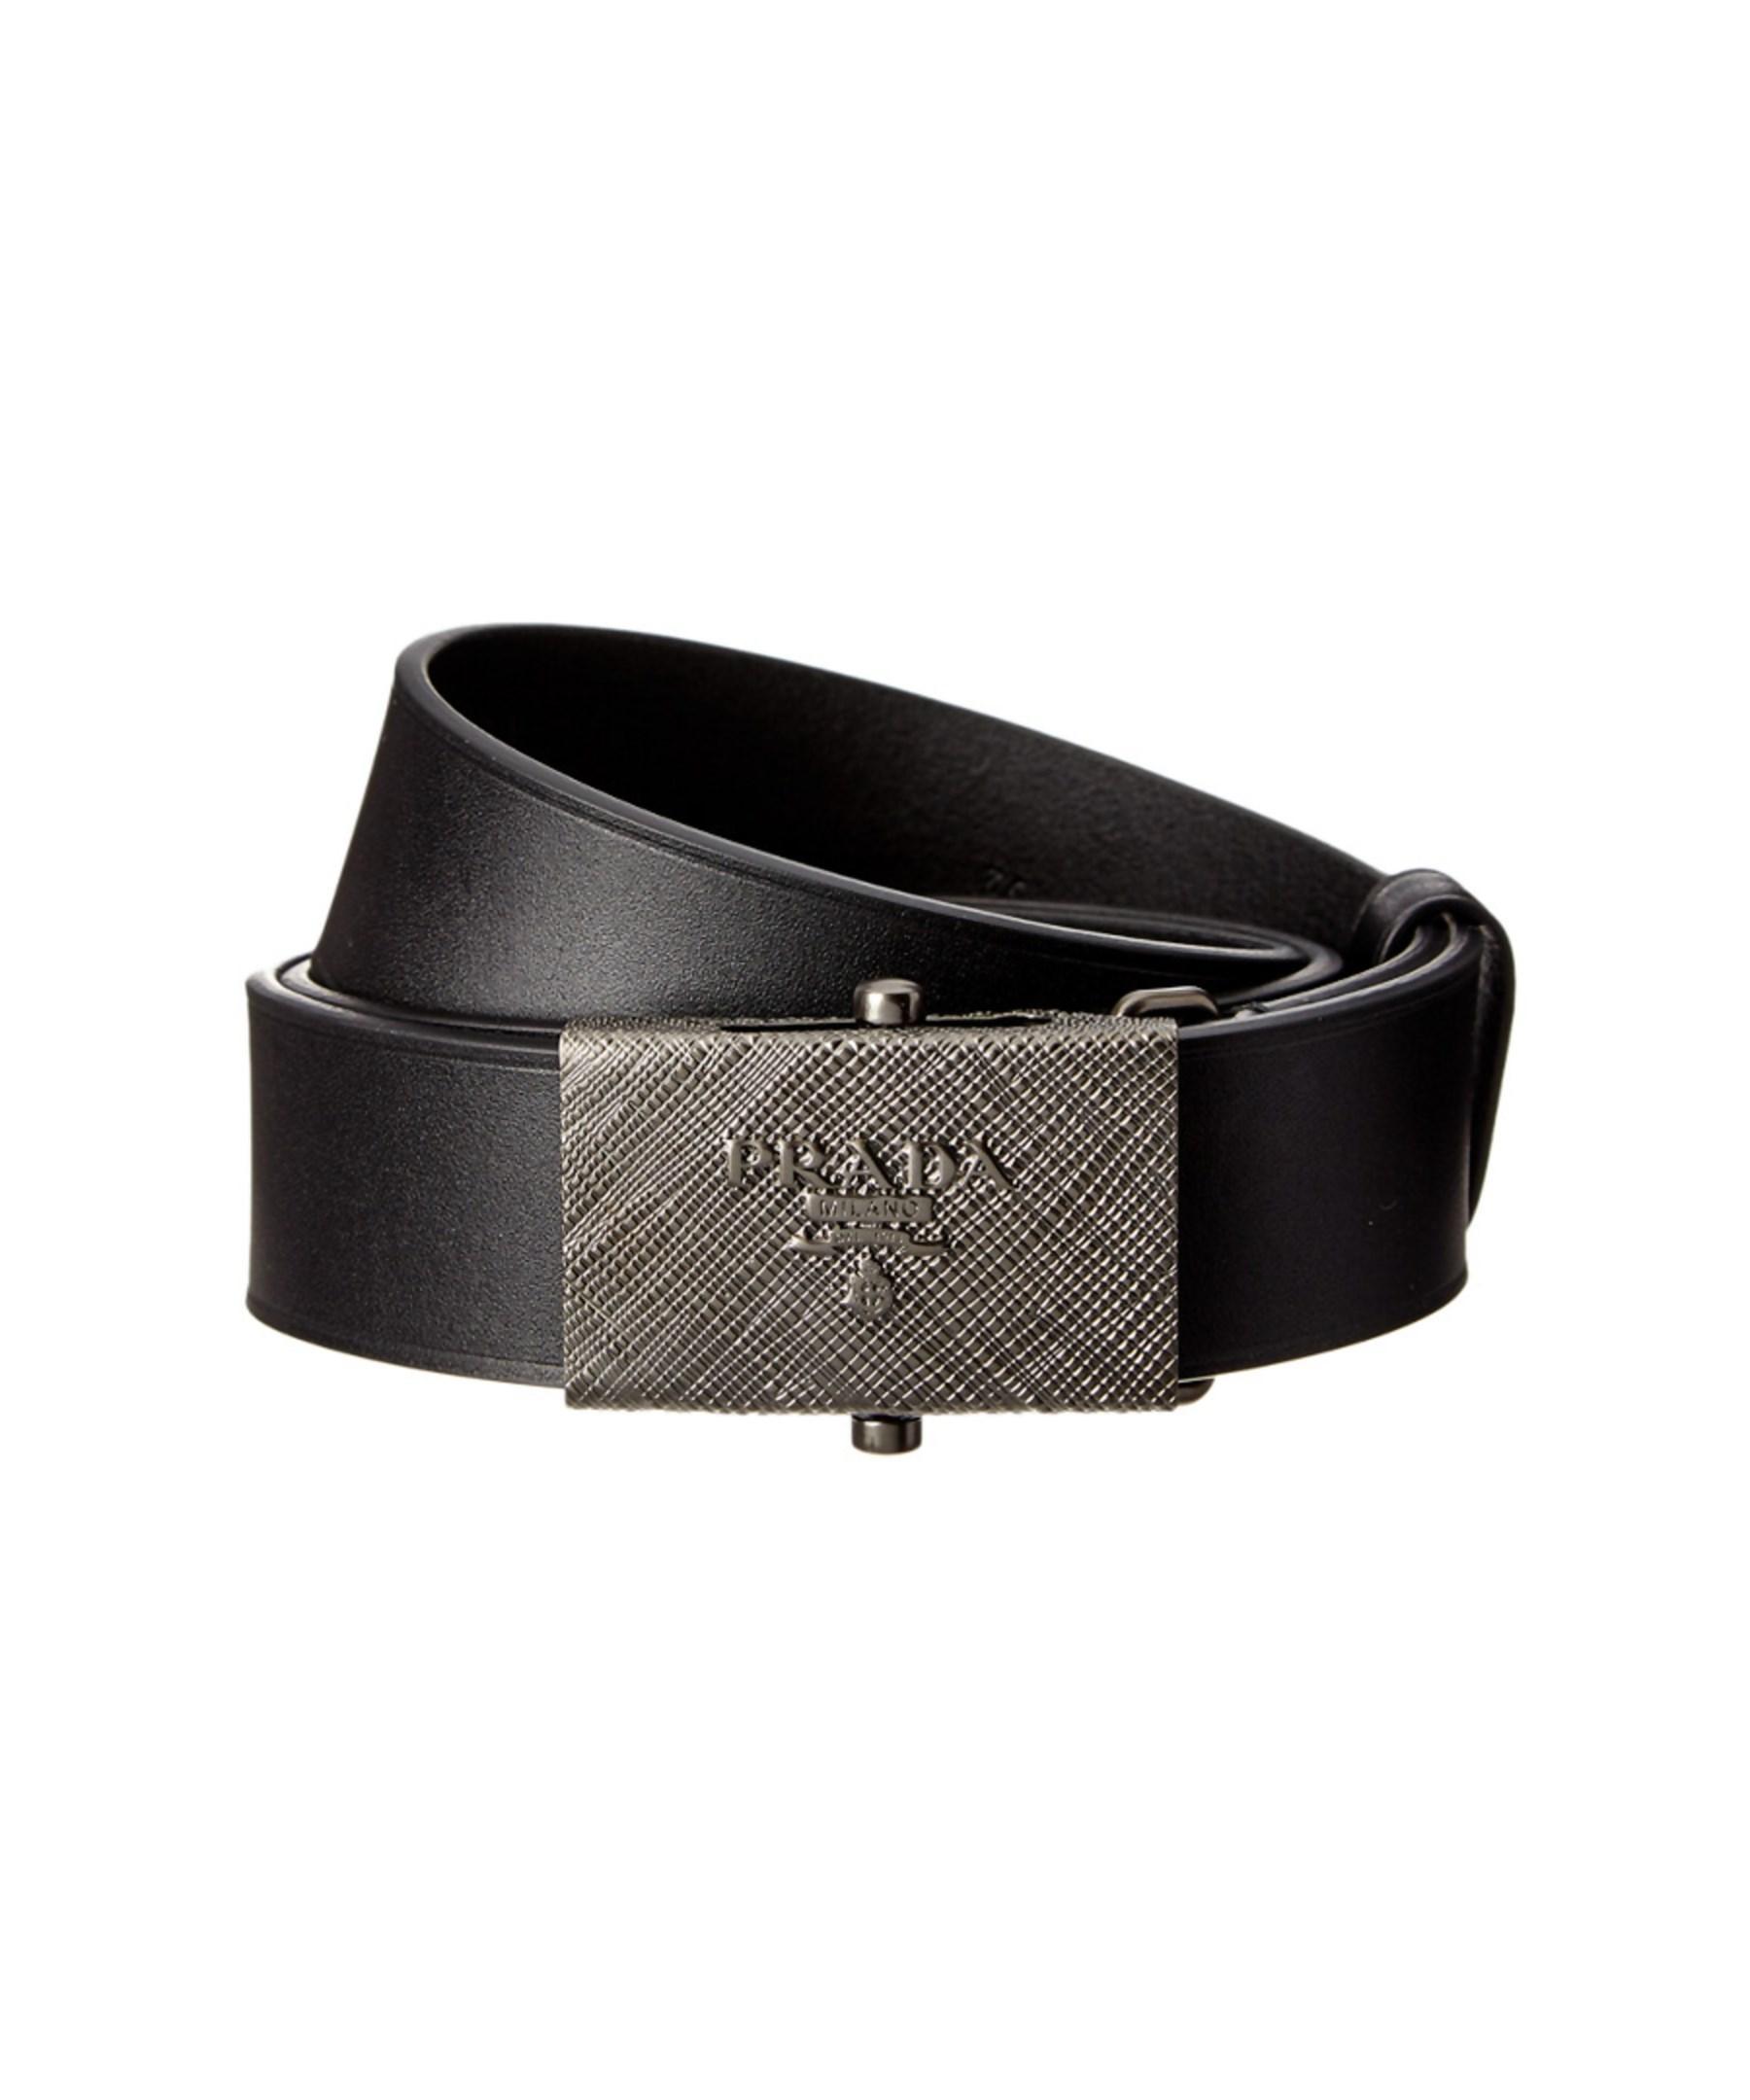 prada calf leather belt in black for lyst